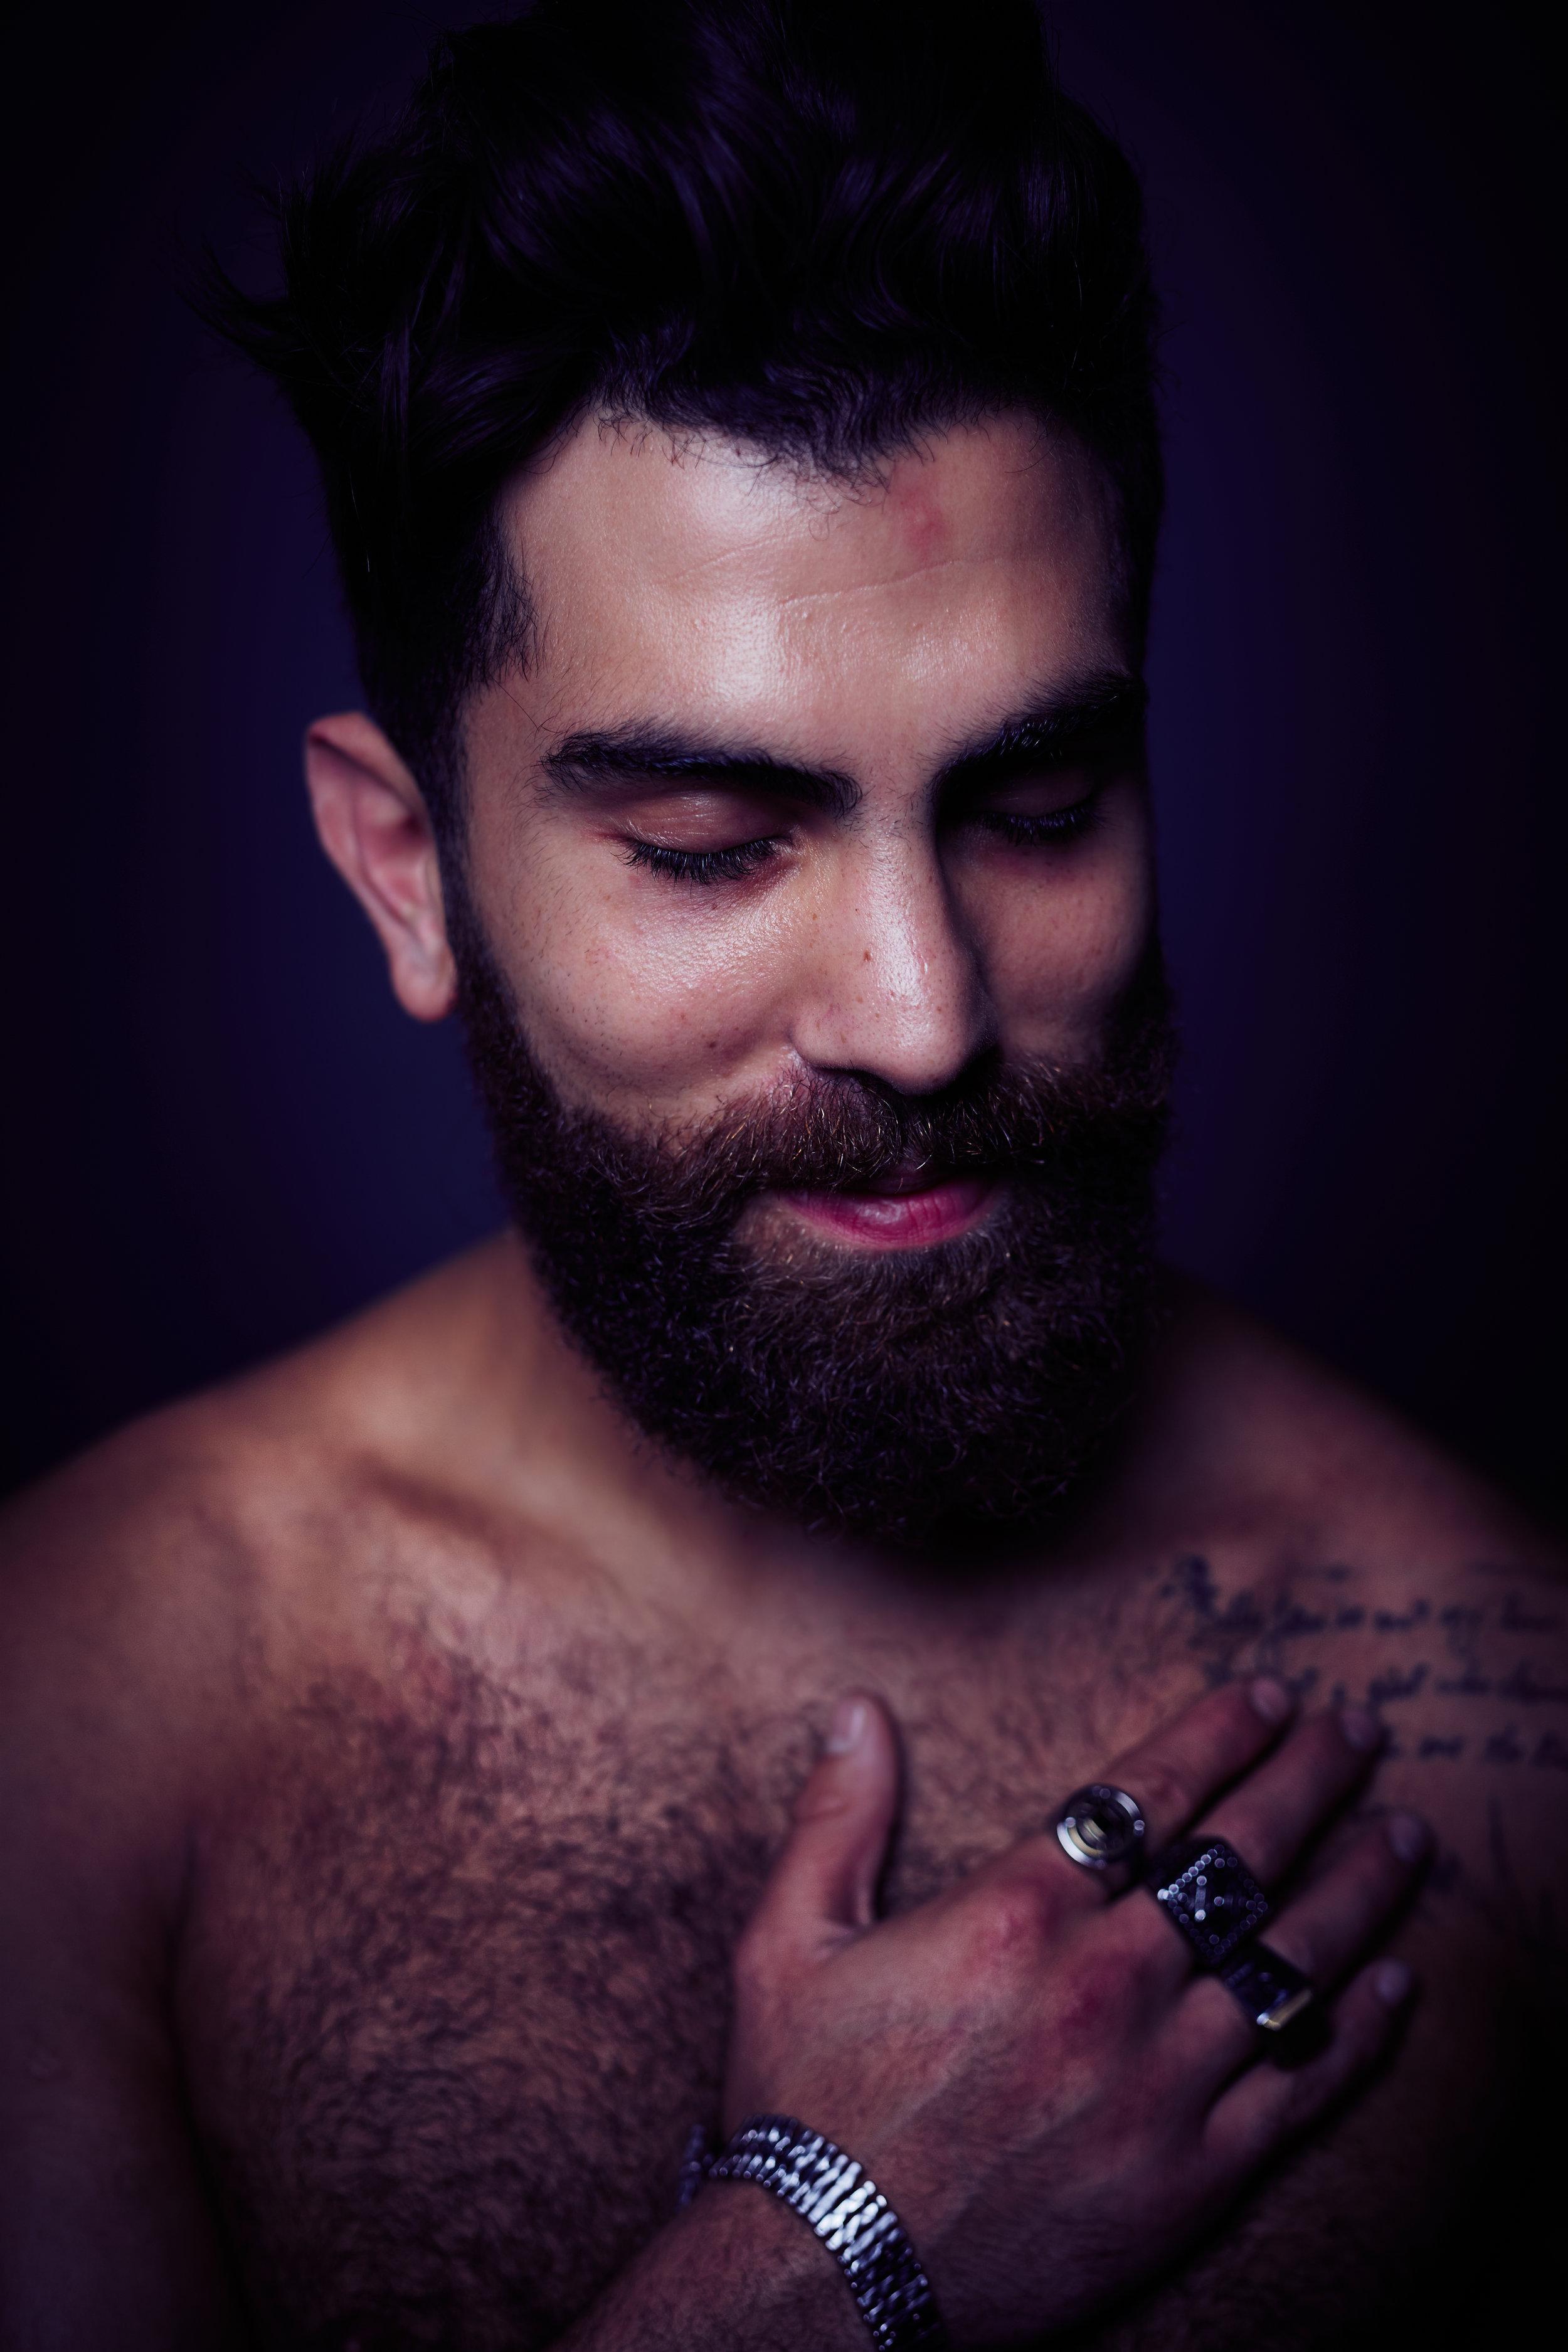 Portrait_063_Reza_Jackson_10308.jpg